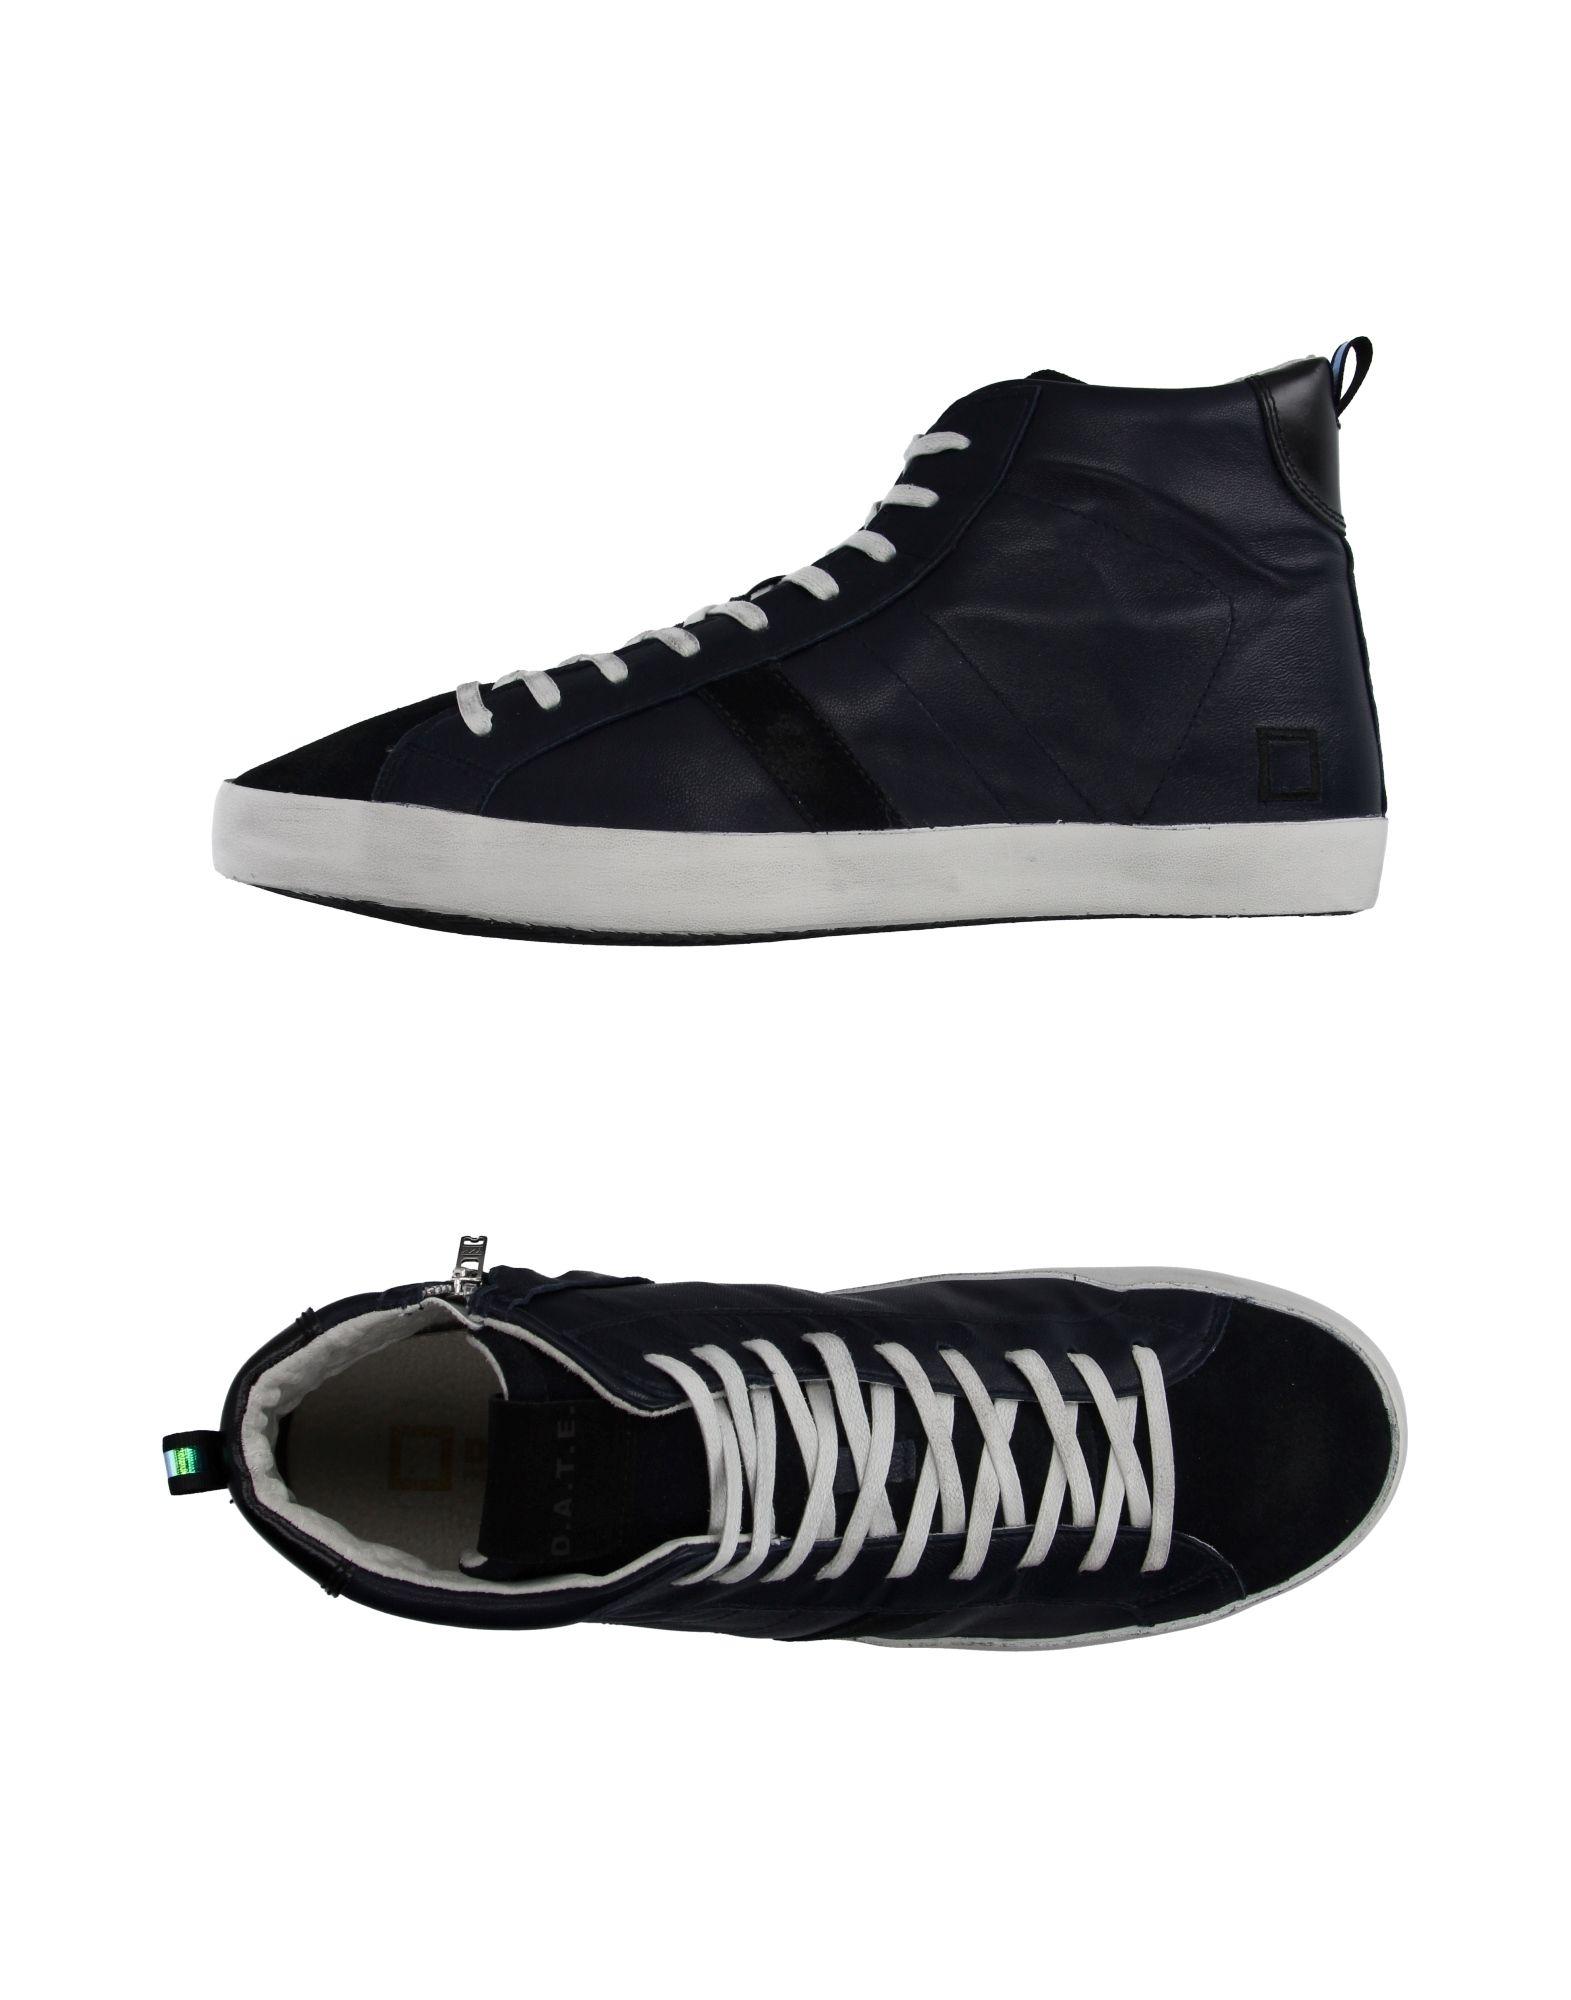 D.A.T.E. Высокие кеды и кроссовки кеды кроссовки высокие dc council mid tx stone camo